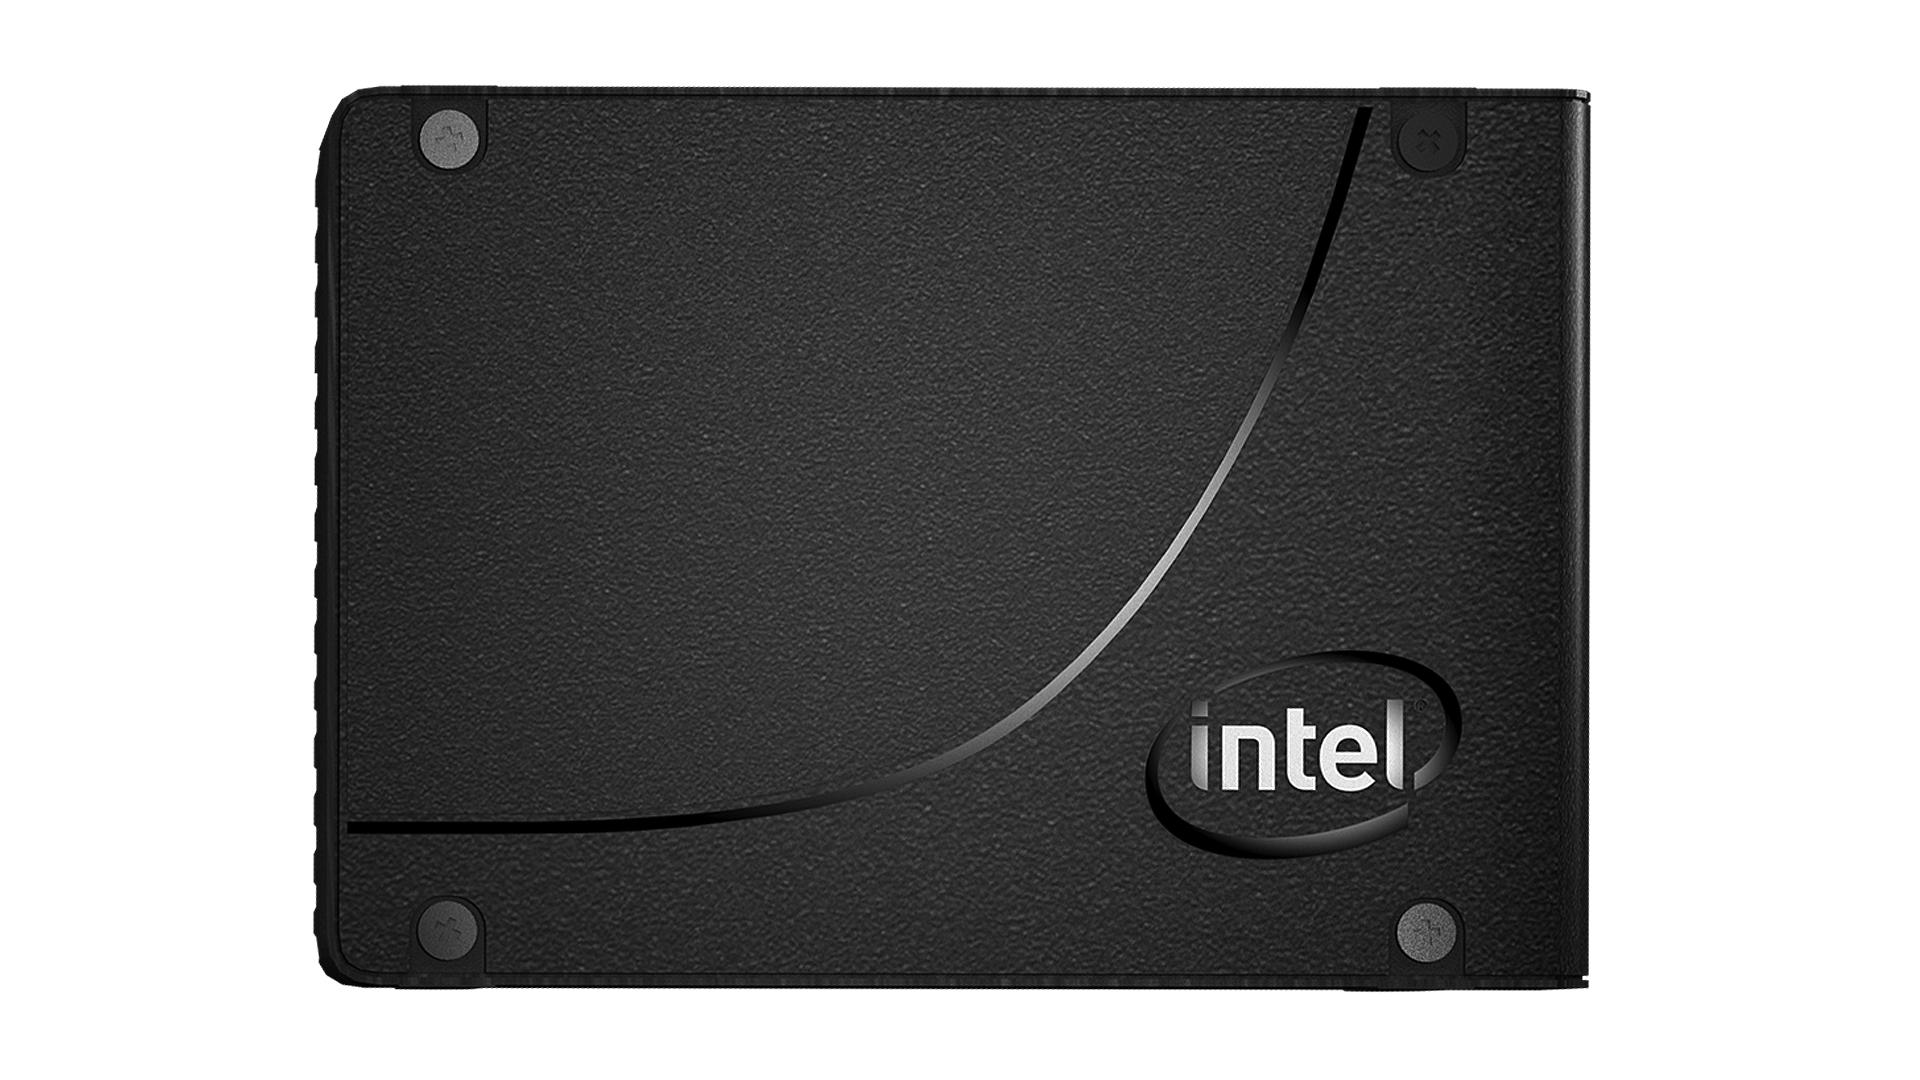 Intel Optane SSDPE21K100GA01 internal solid state drive 43 100 GB PCI Express 3.0 3D XPoint NVMe